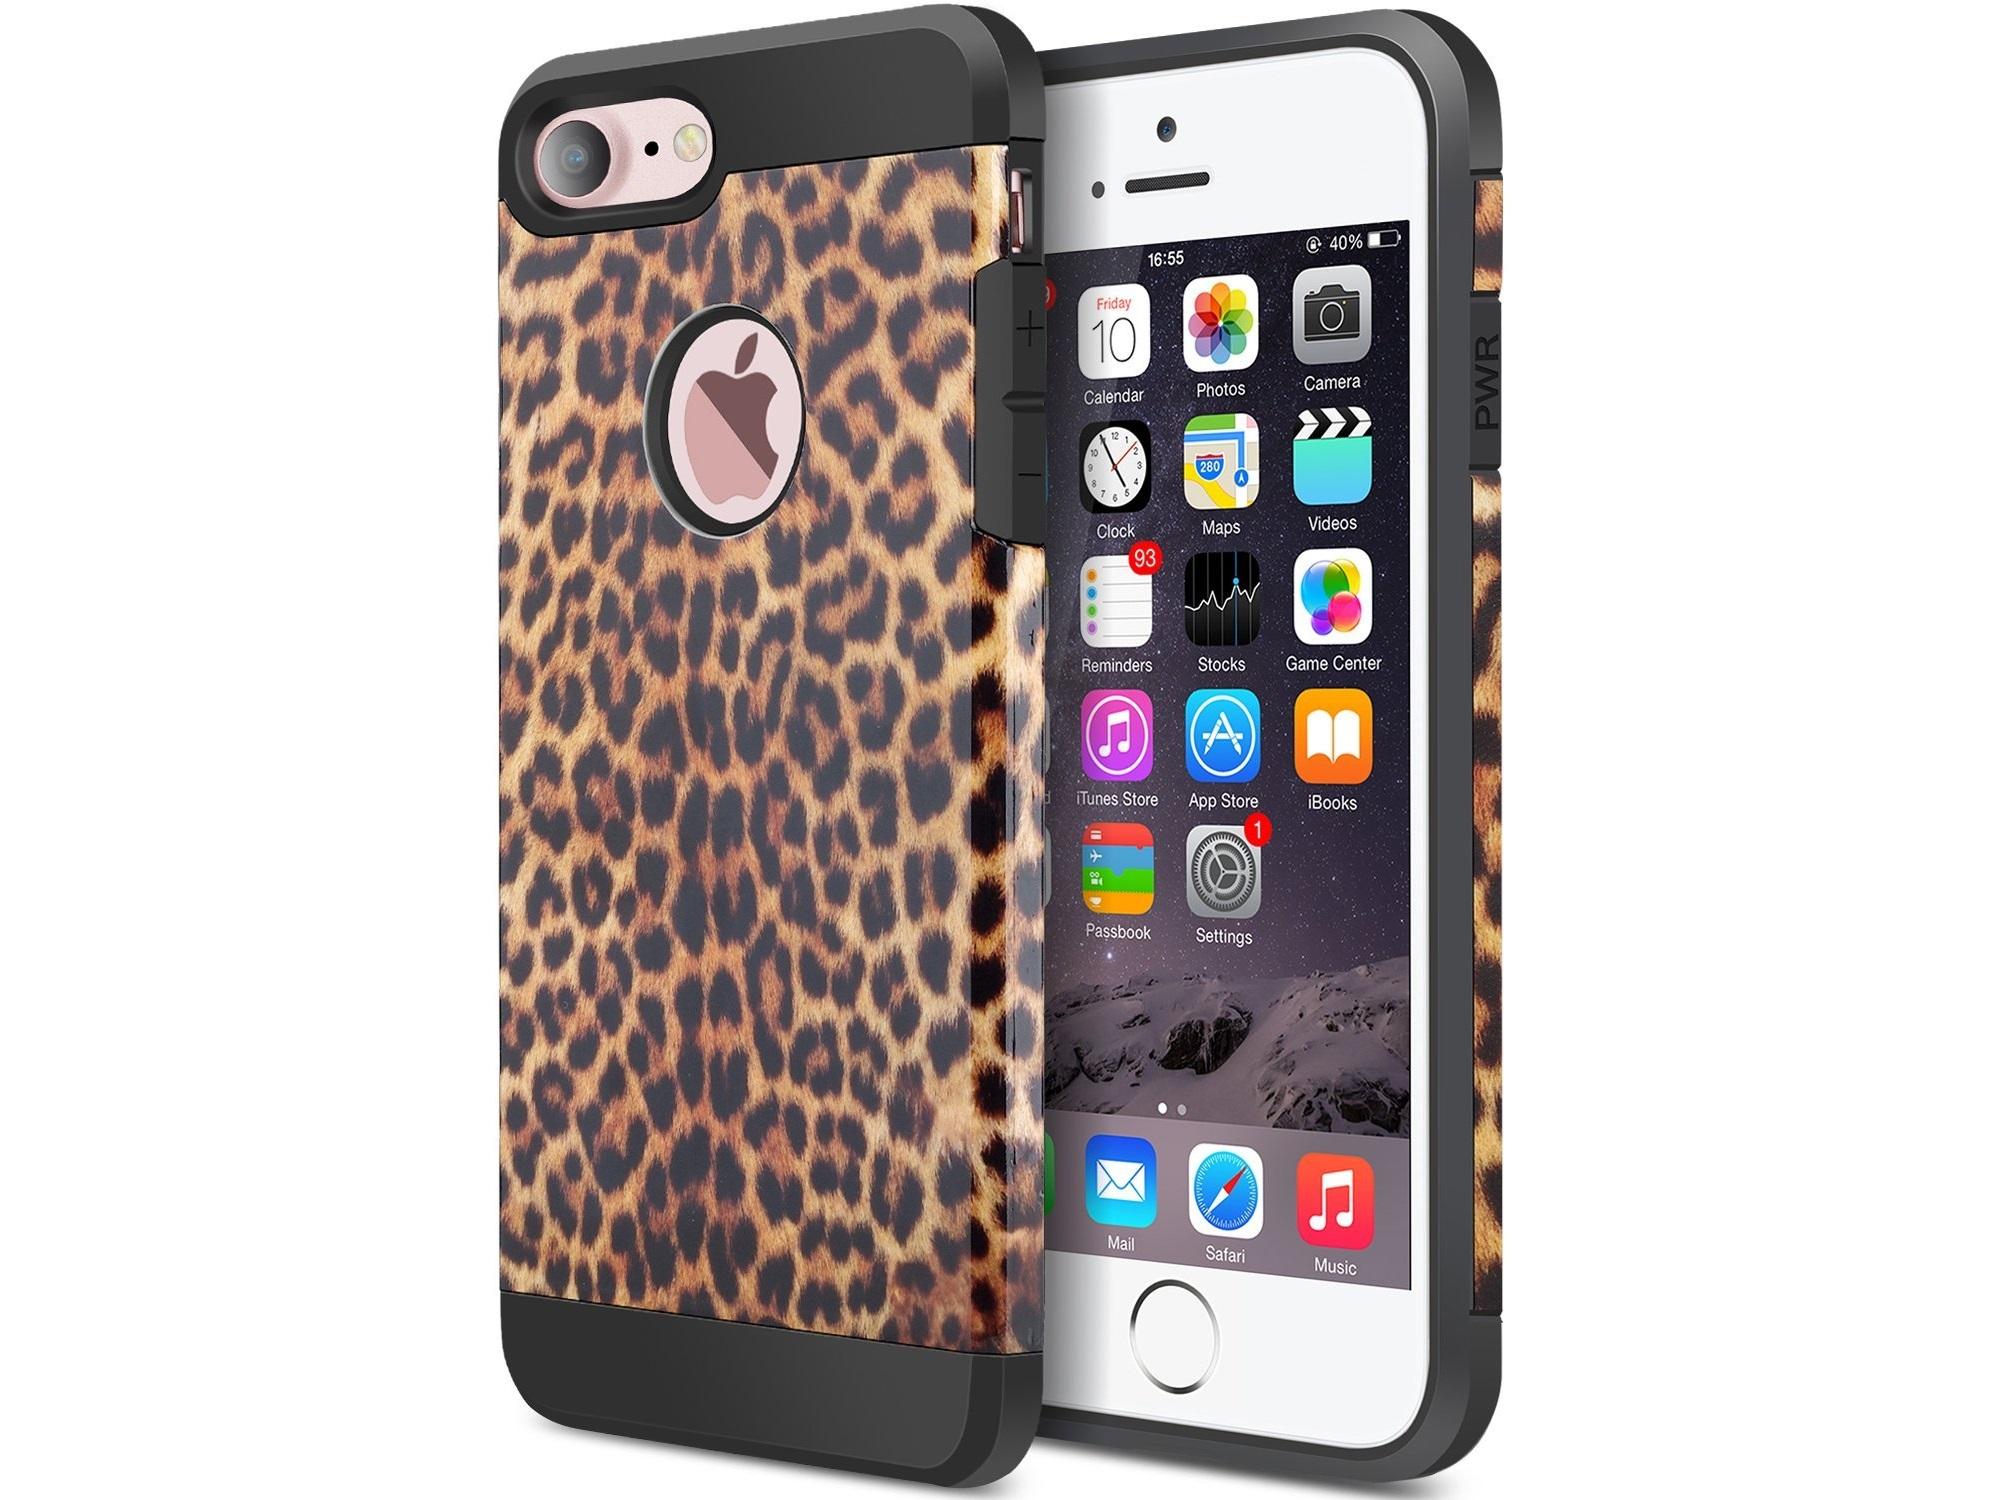 The classic leopard print